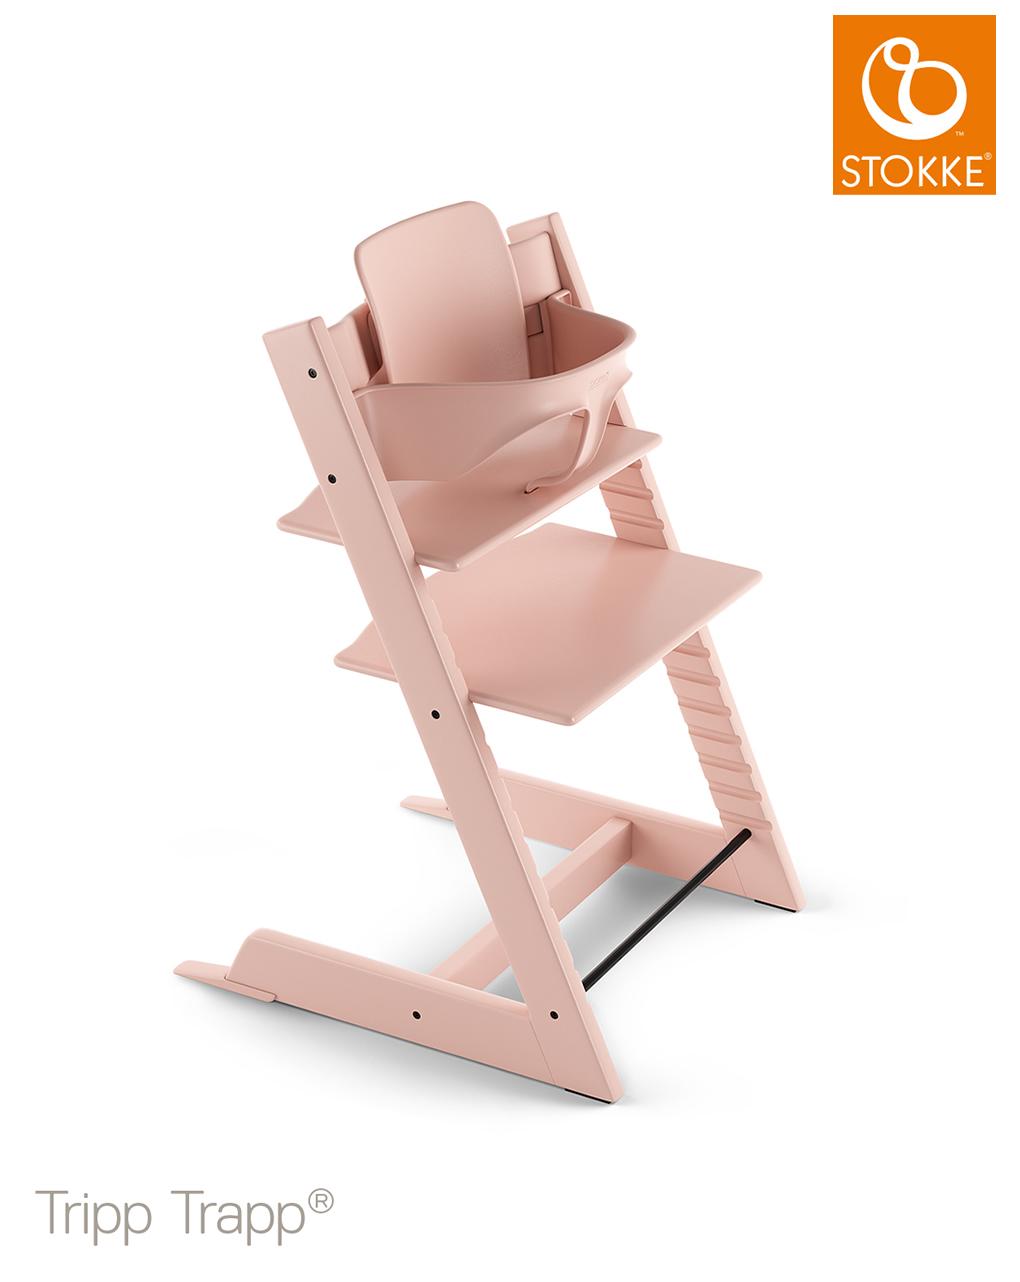 Stokke® baby set per tripp trapp® – serene pink - Stokke